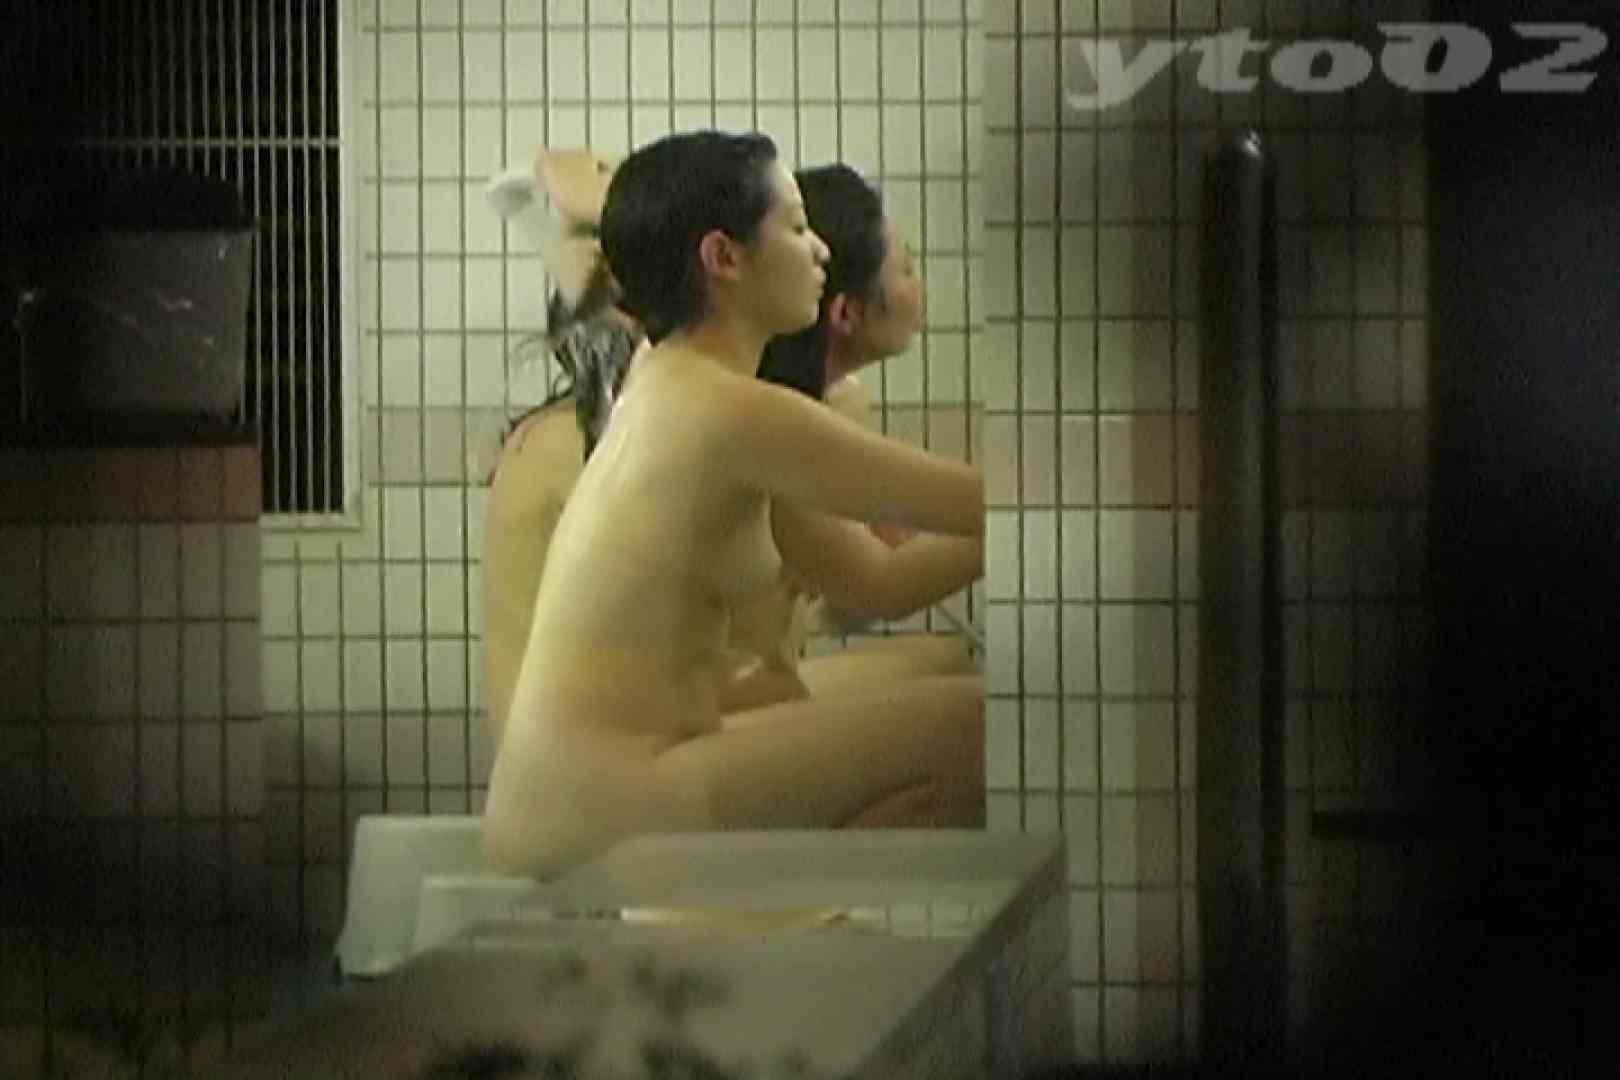 ▲復活限定▲合宿ホテル女風呂盗撮 Vol.12 合宿 | OL  26連発 3